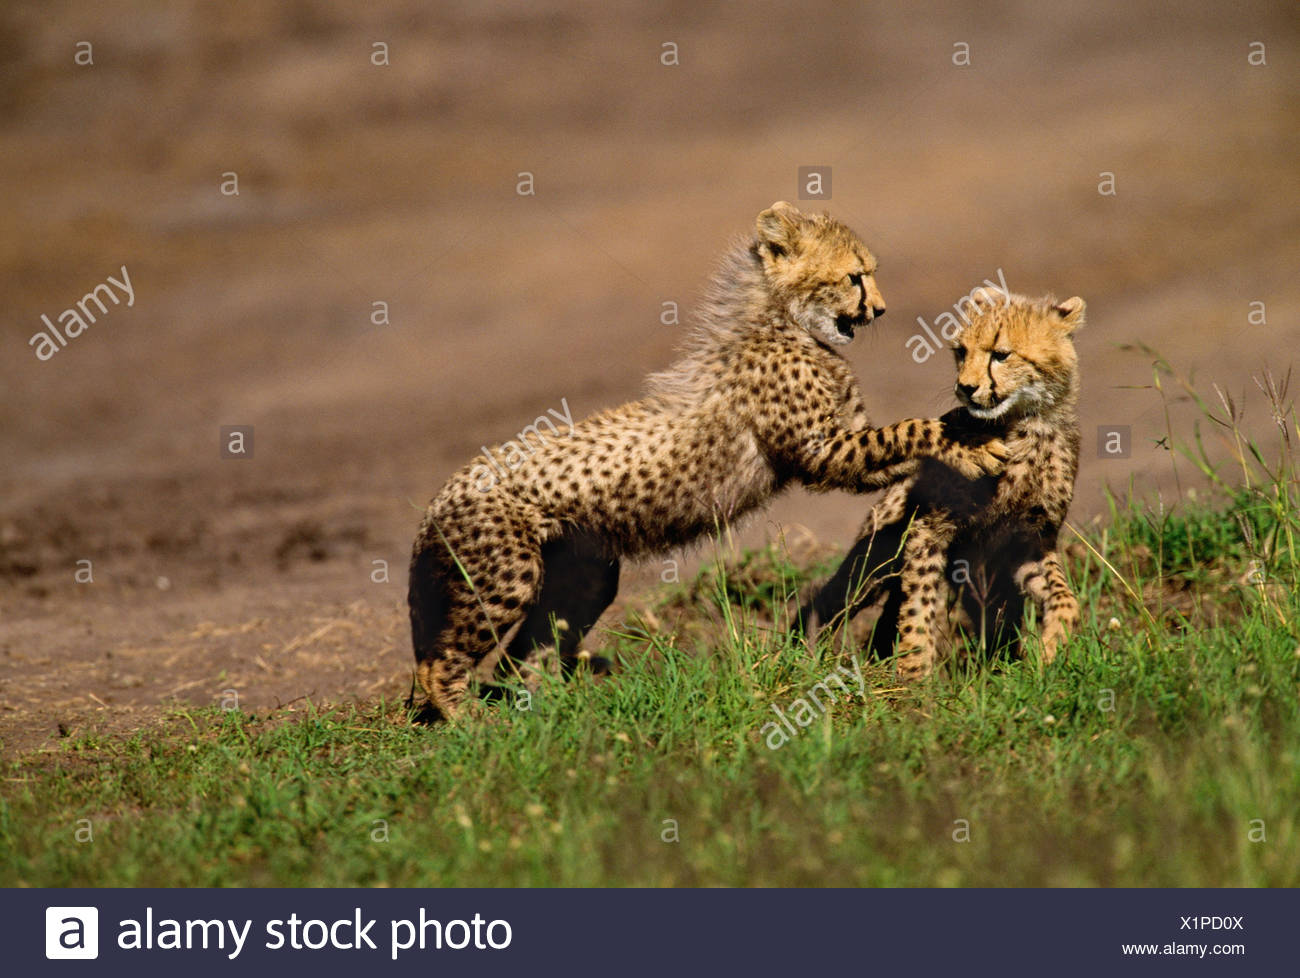 Cheetah cubs, Masai Mara National Reserve, Kenya - Stock Image